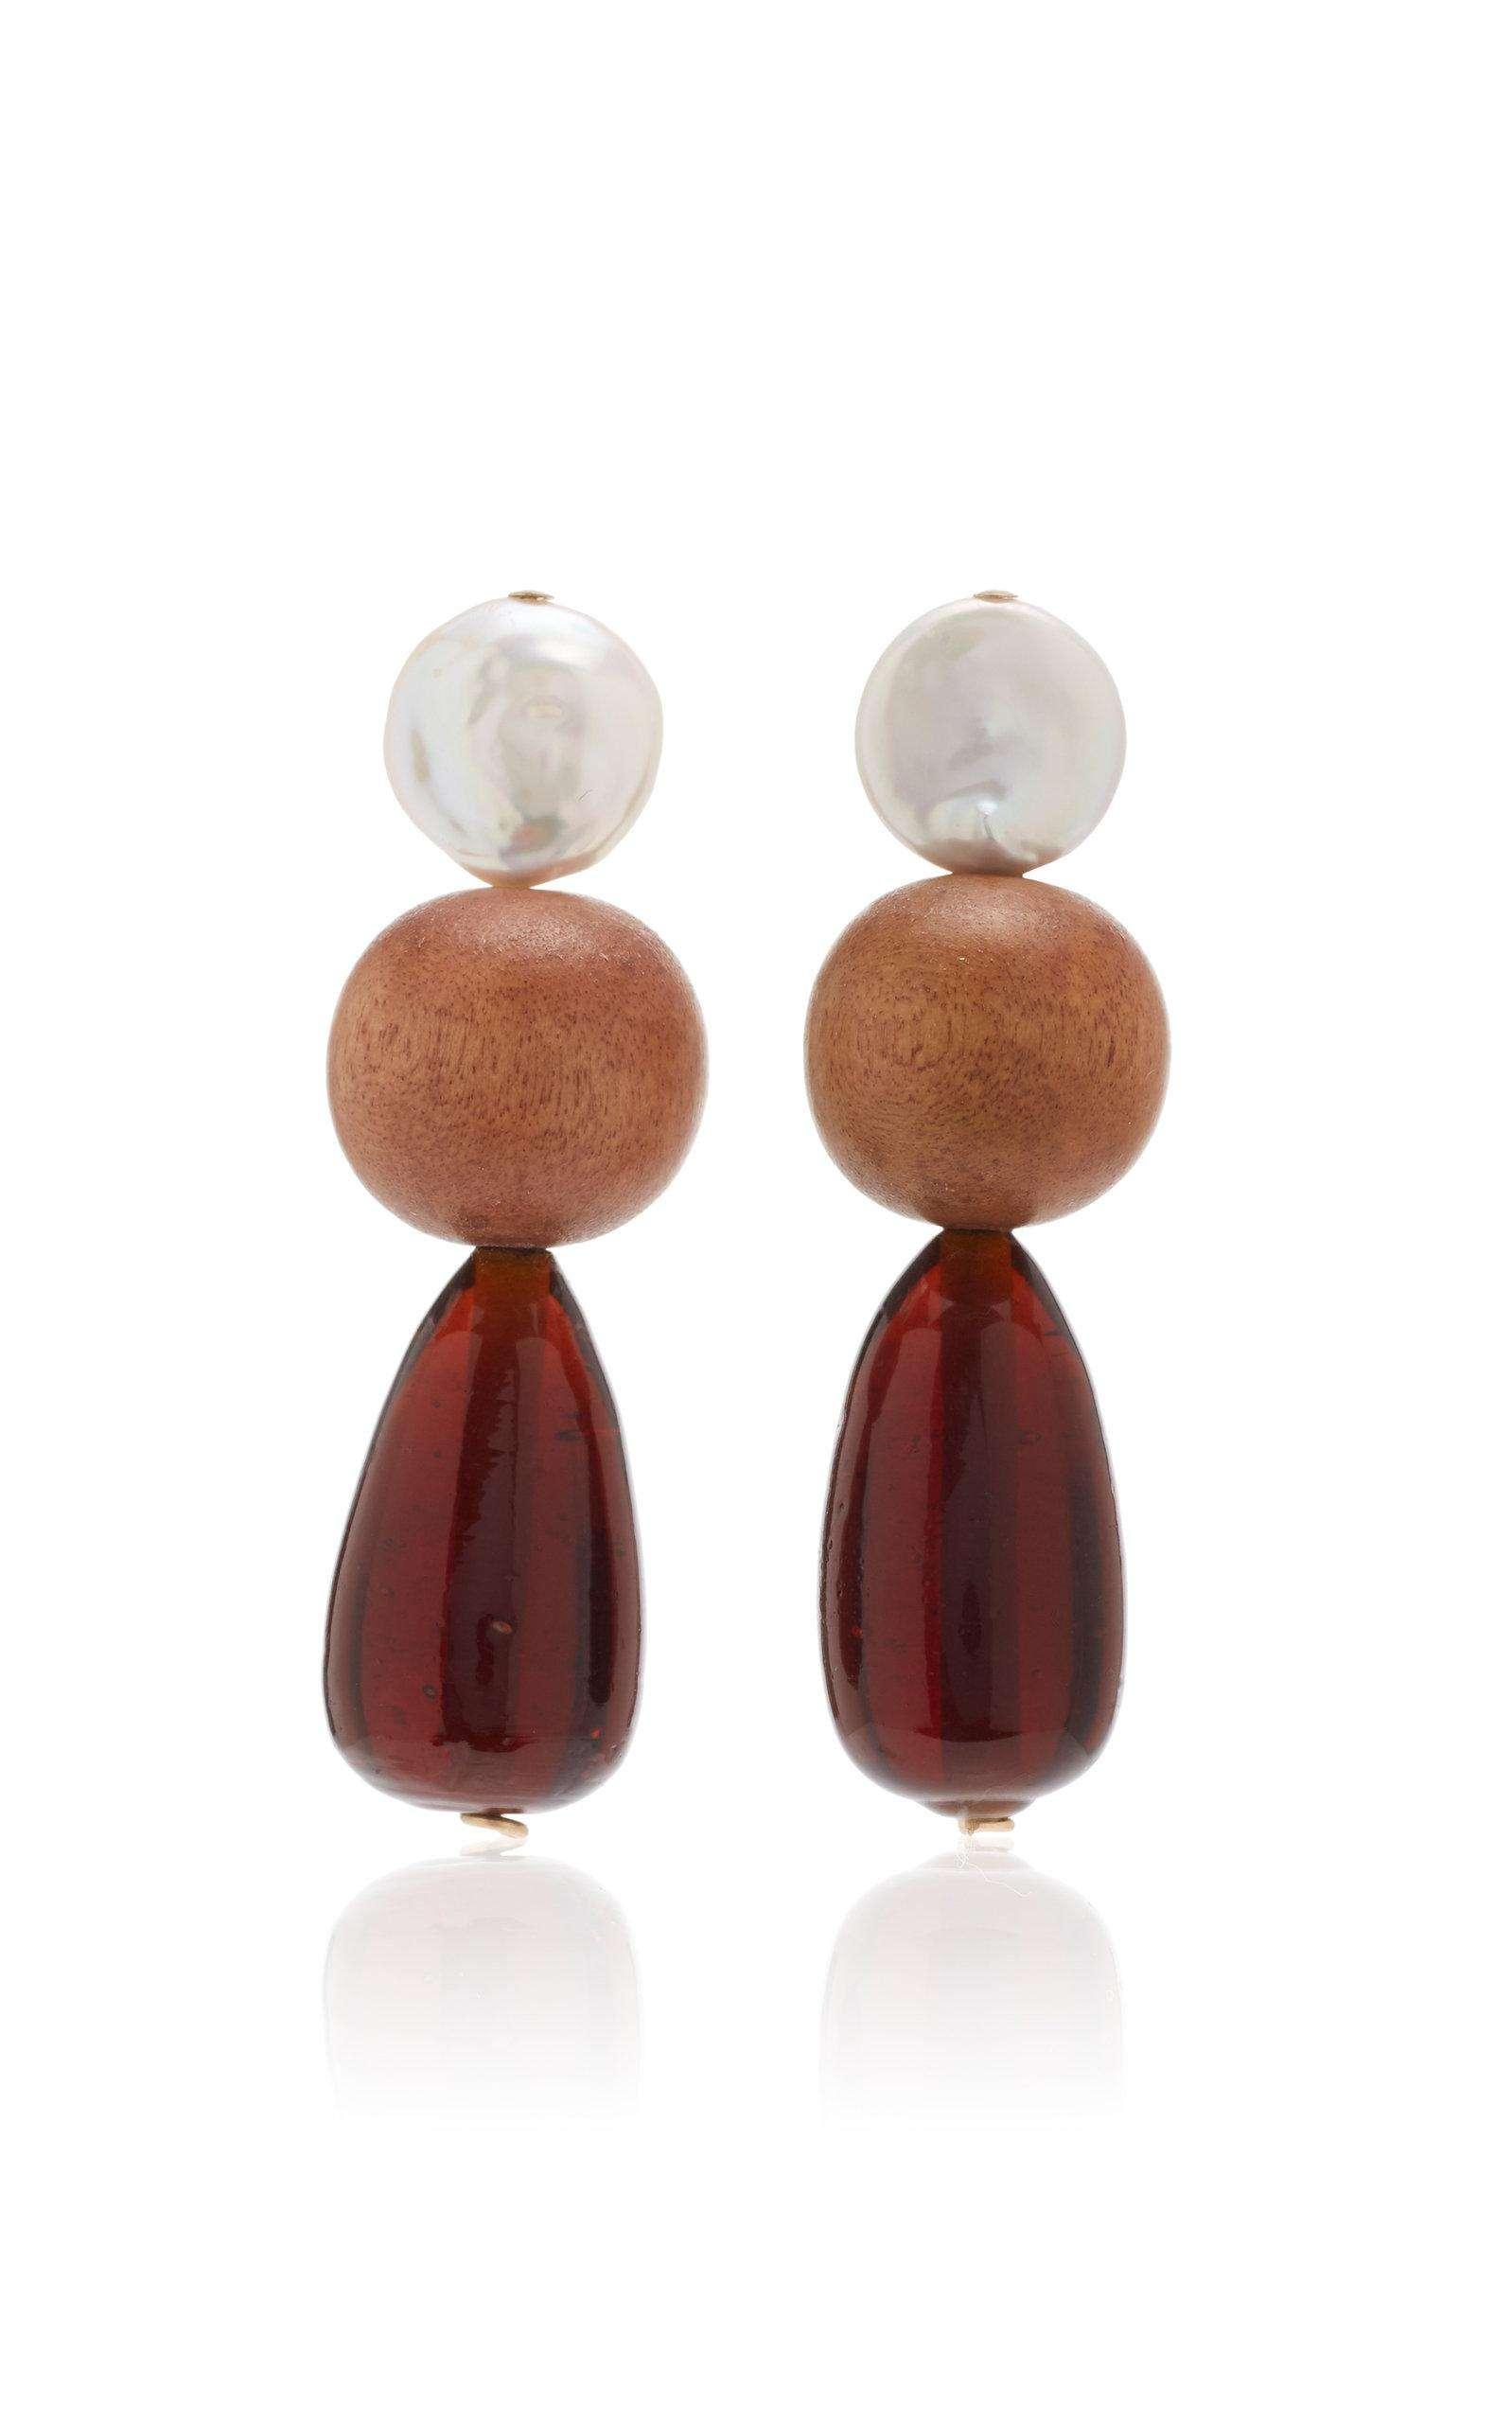 Resort Wear Finds Under $100: Wood and Pearl Drop Earrings | Rhyme & Reason